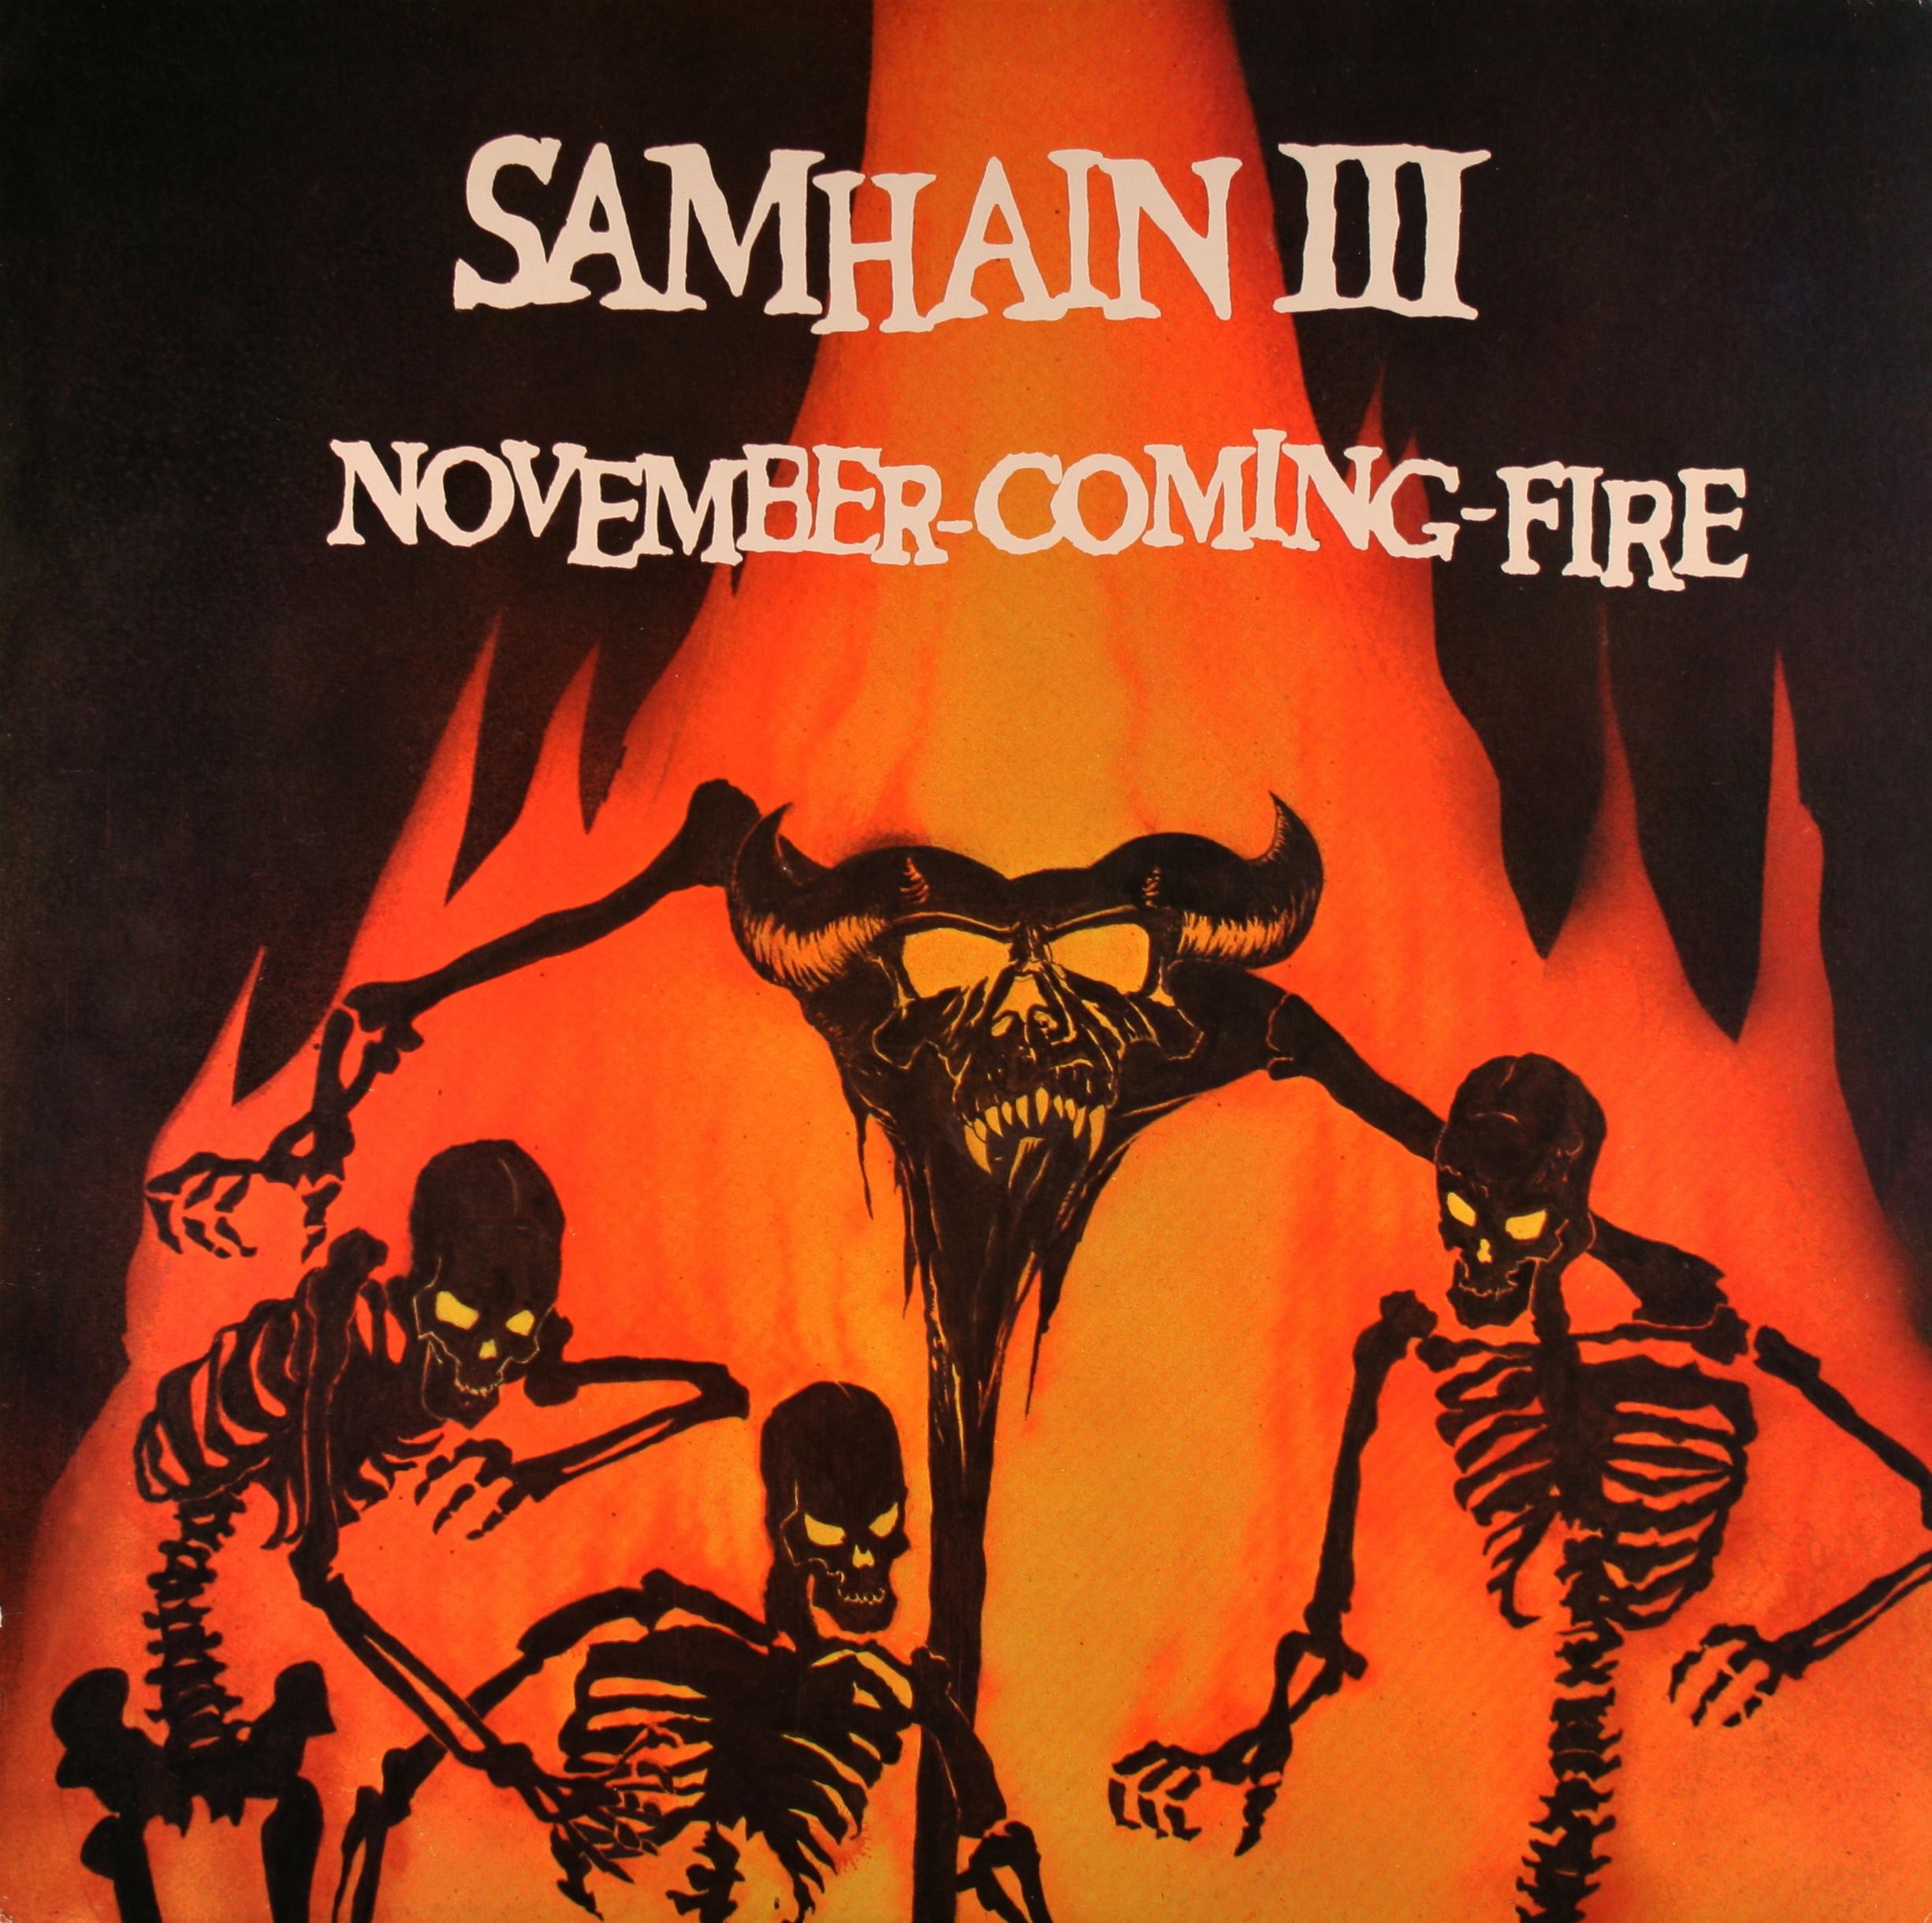 SamhainIII.jpg